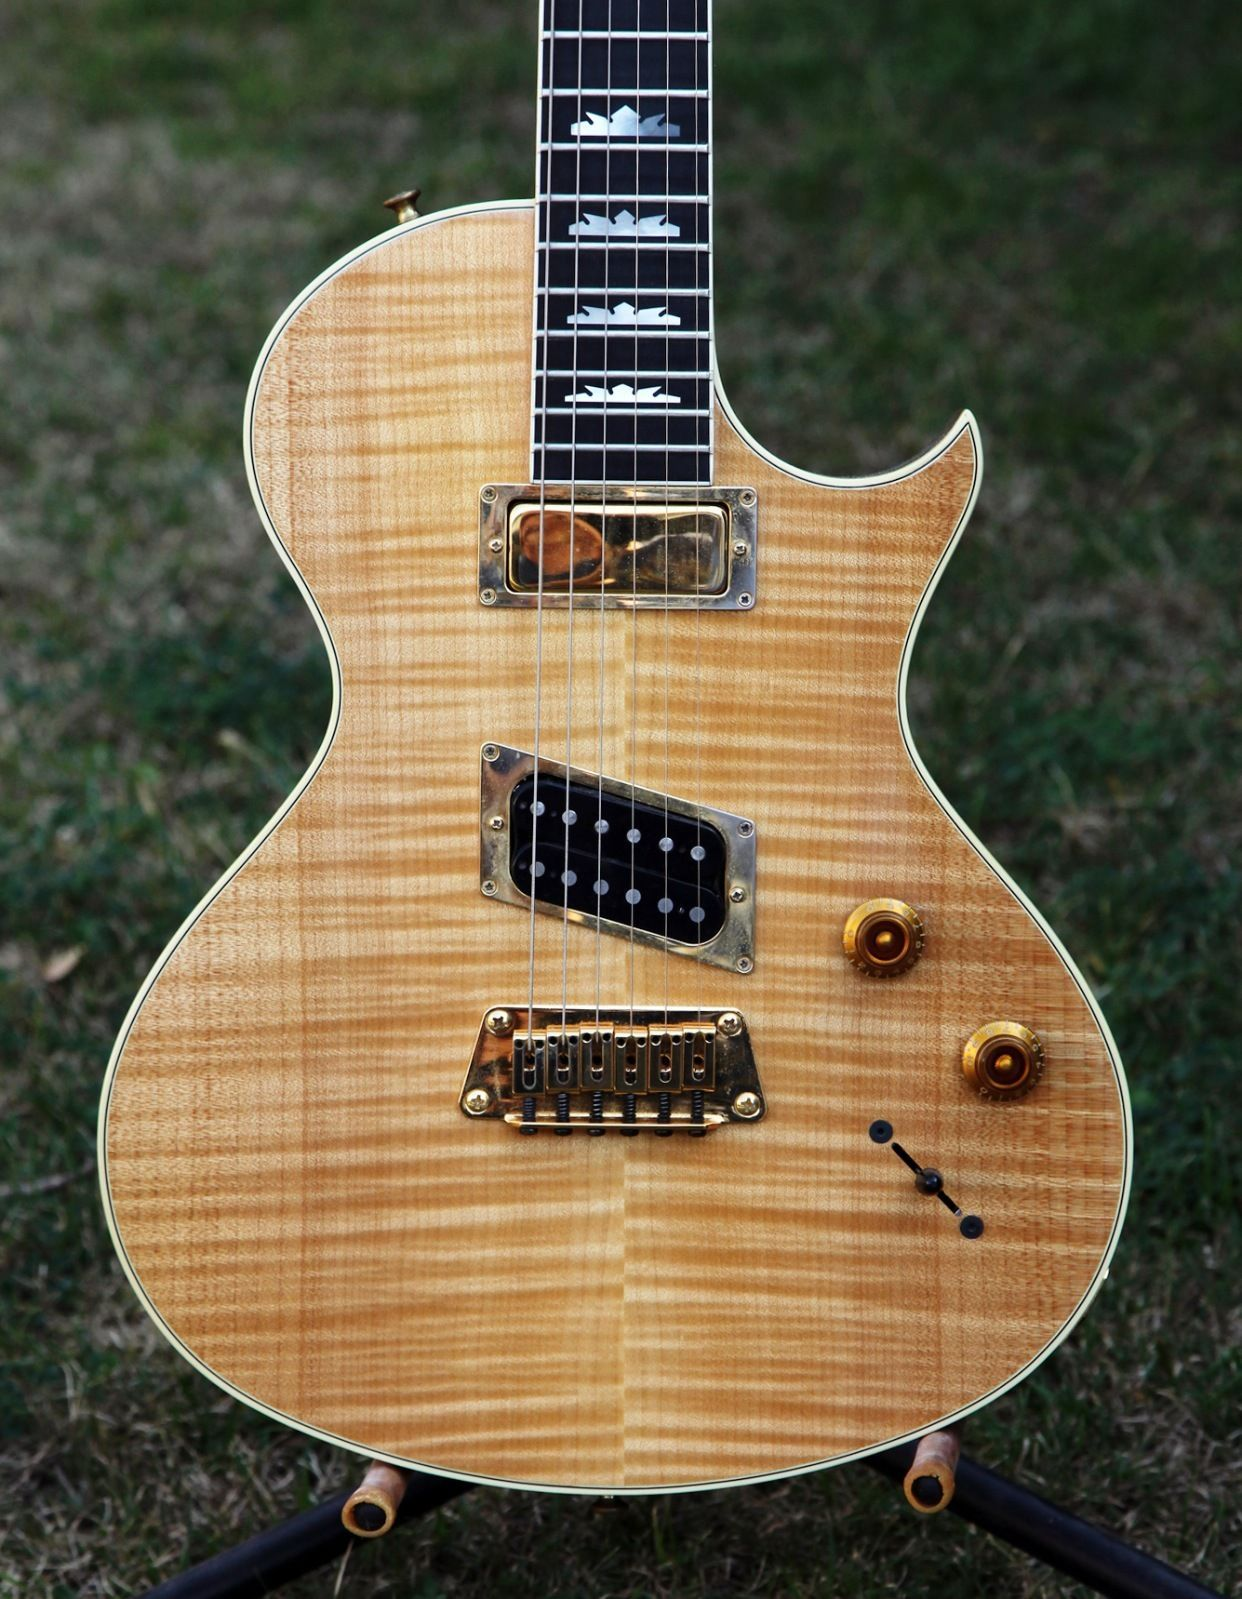 1997 Gibson Nighthawk Custom Cst Natural Flame 6 String Electric Epi Vs Selector Switch Mylespaulcom Guitar Usa